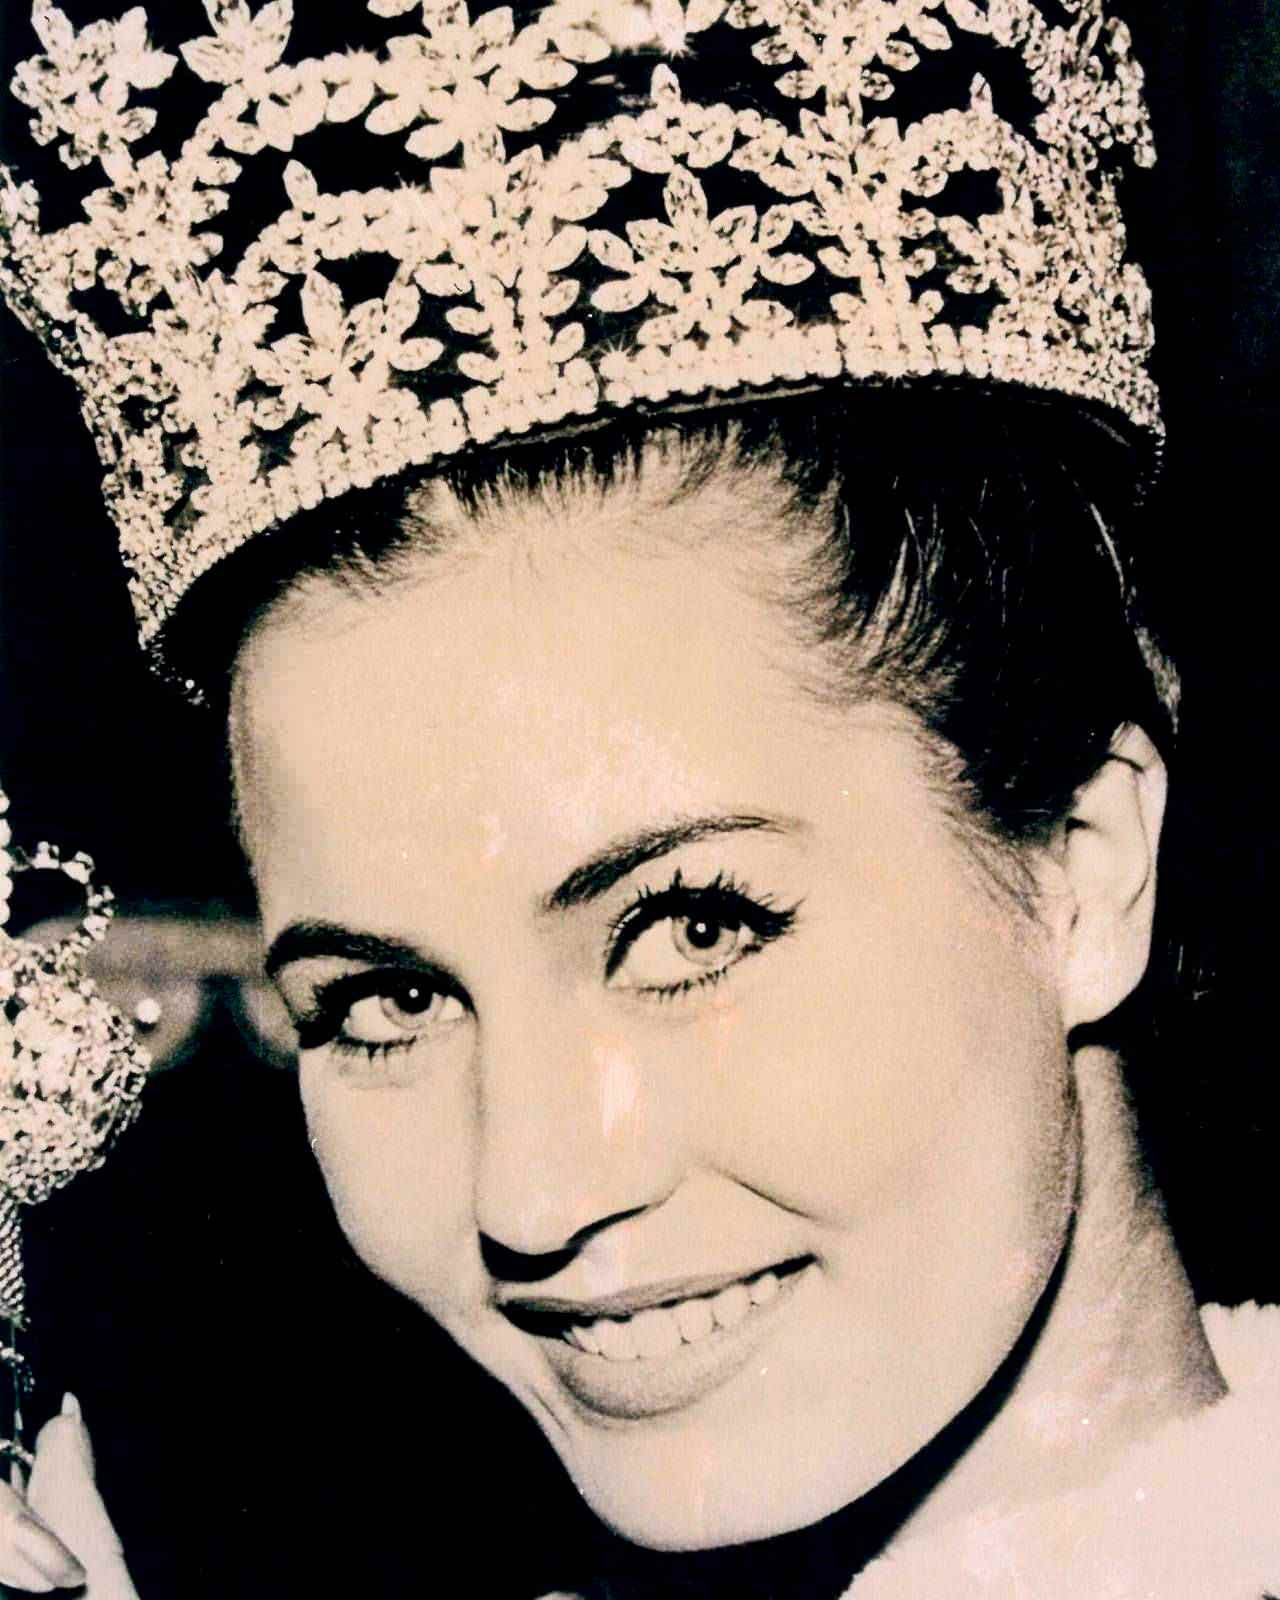 Фото   Мисс Мира 1962 года Катарина Лоддерс